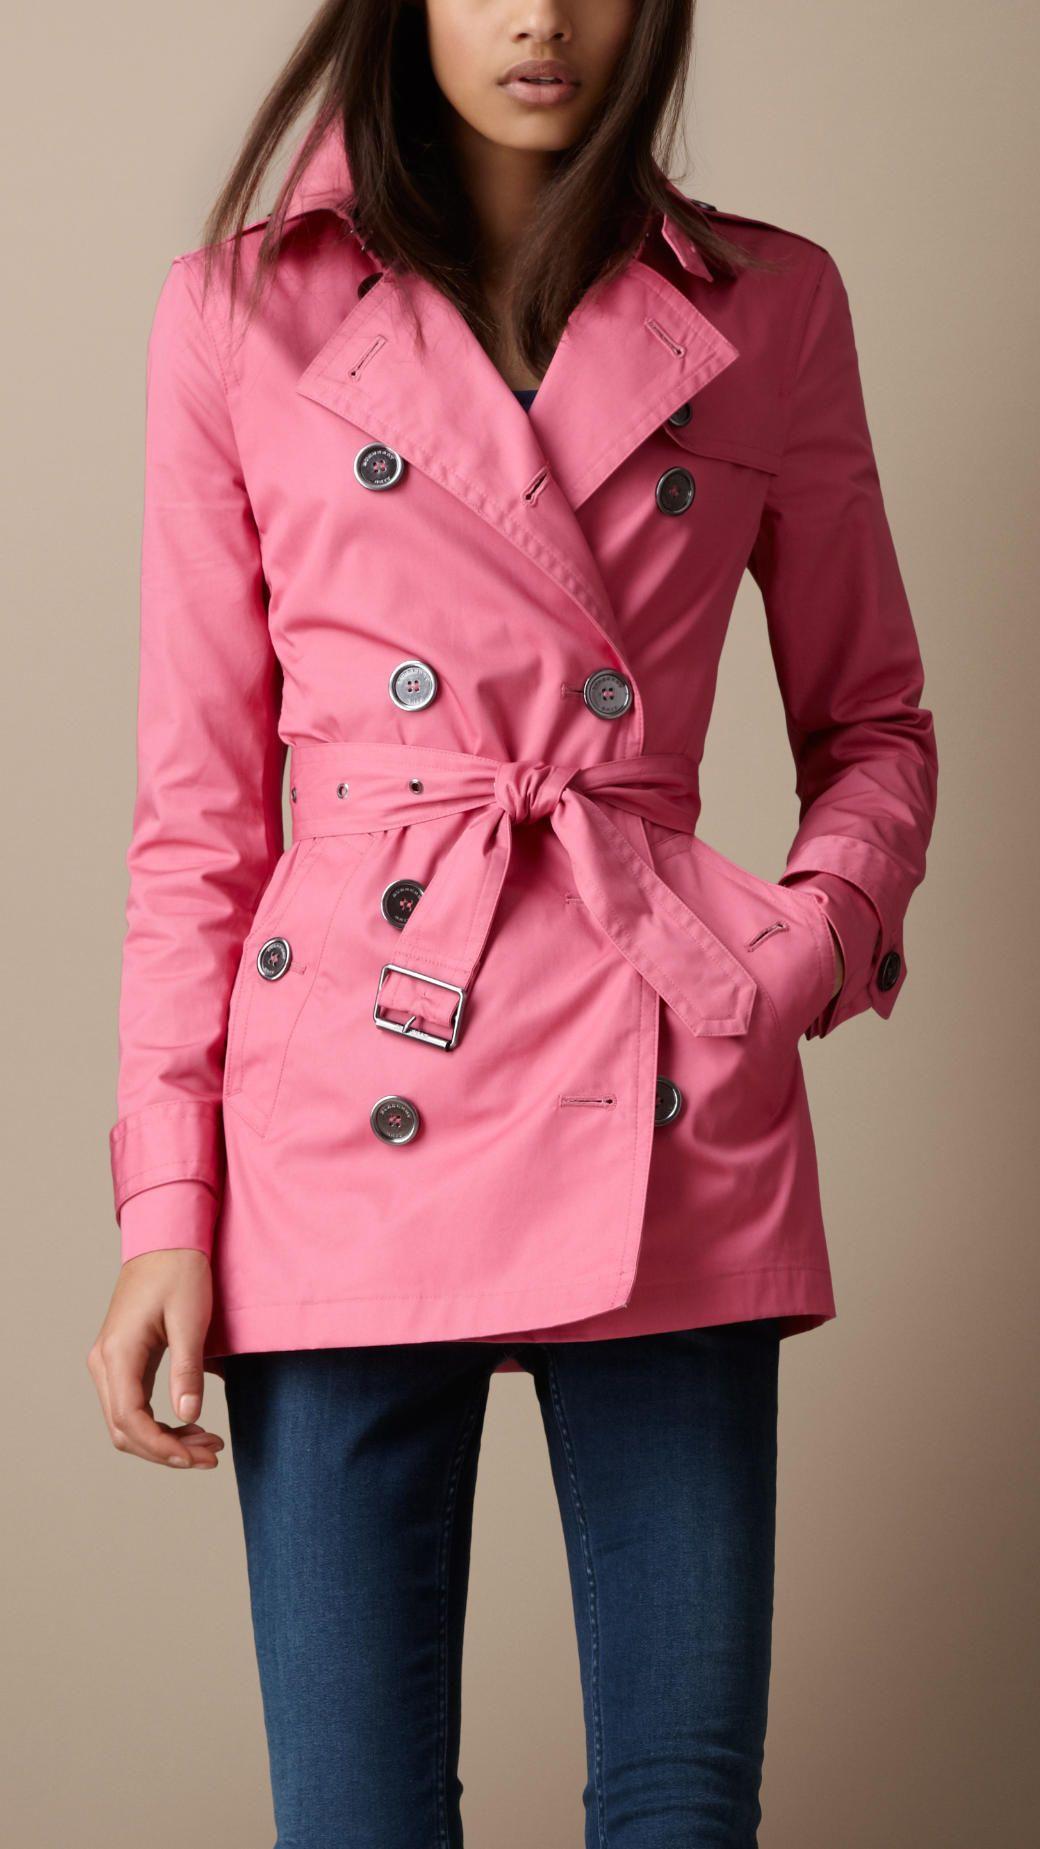 Burberry pink trenchcoat